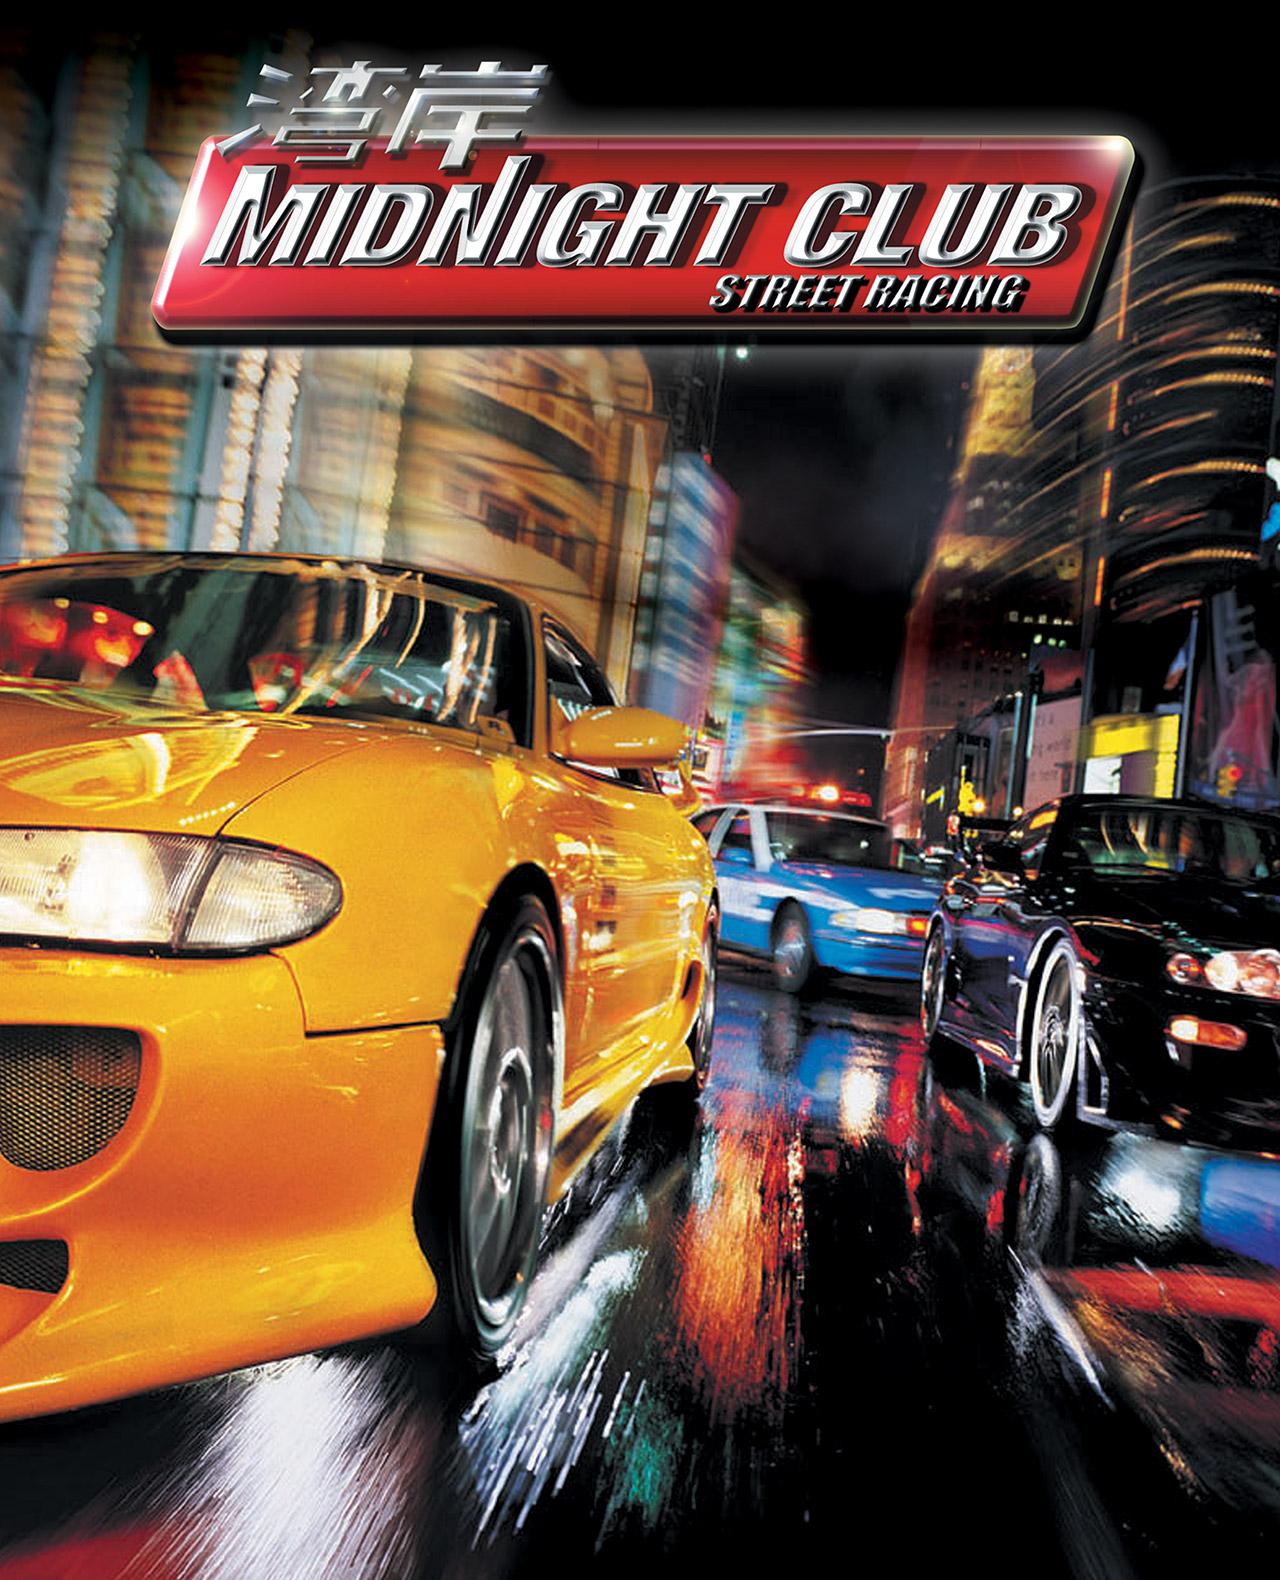 Archivo:Midnight Club - Street Racing Coverart.jpg